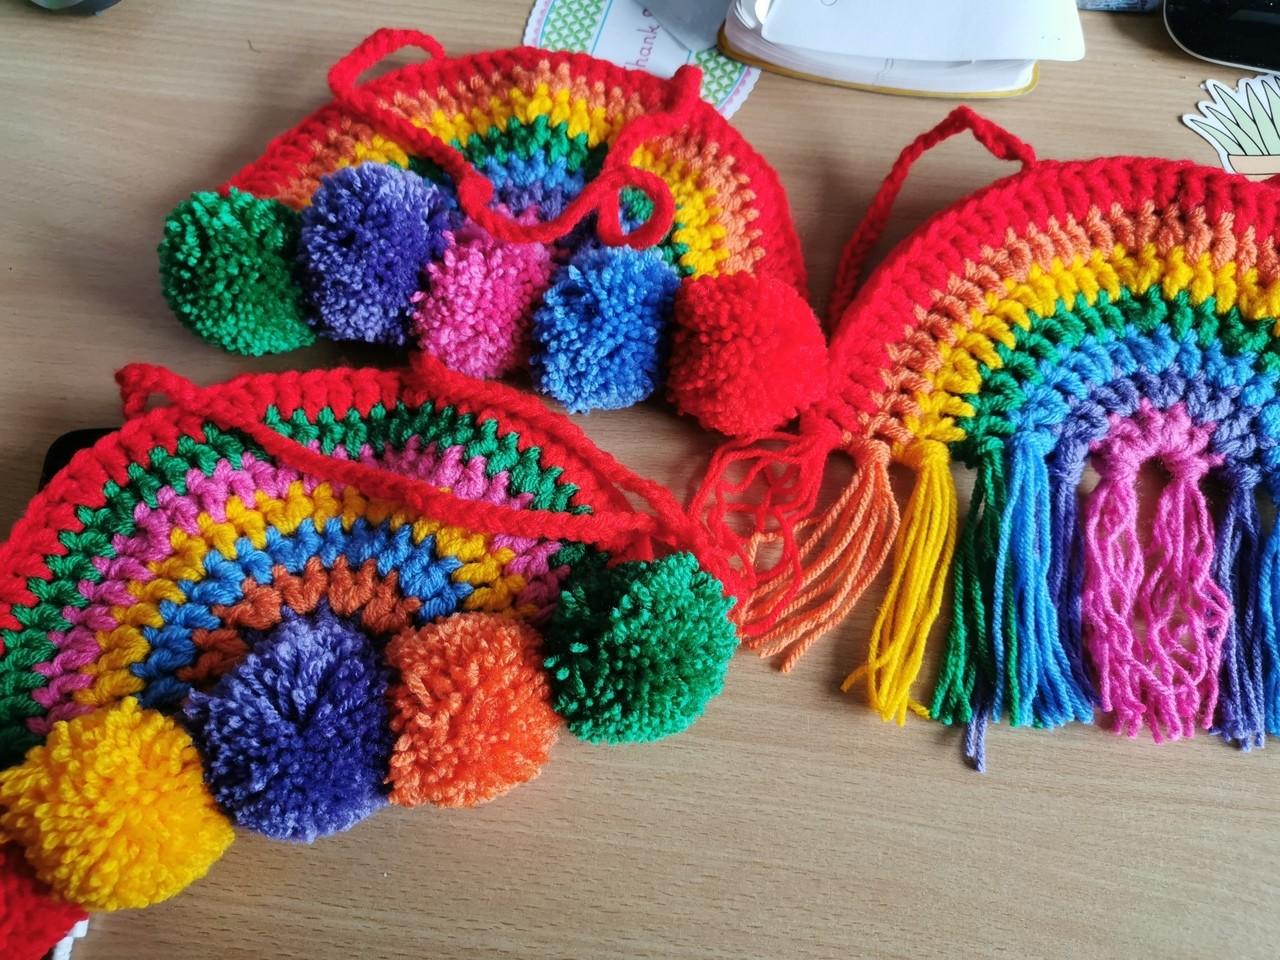 Making rainbows! | Asda Falkirk